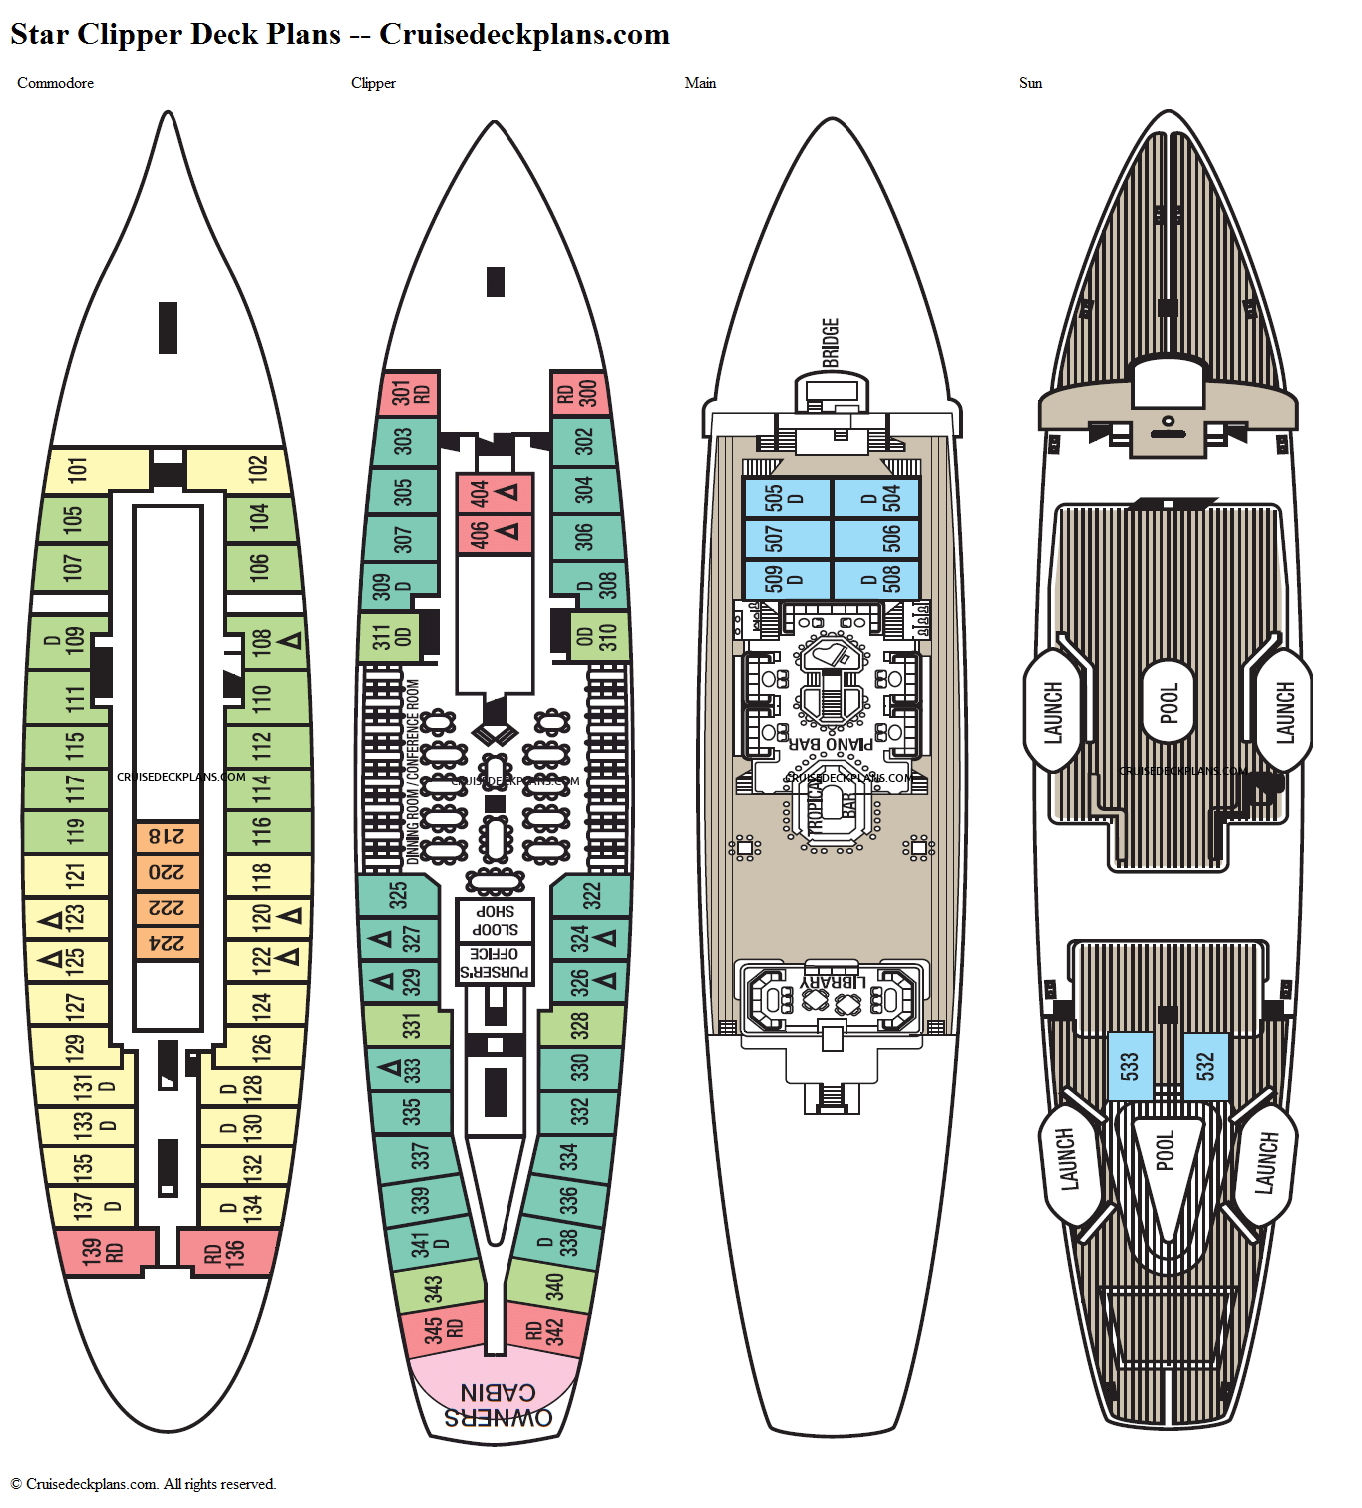 star clipper deck plans diagrams pictures video